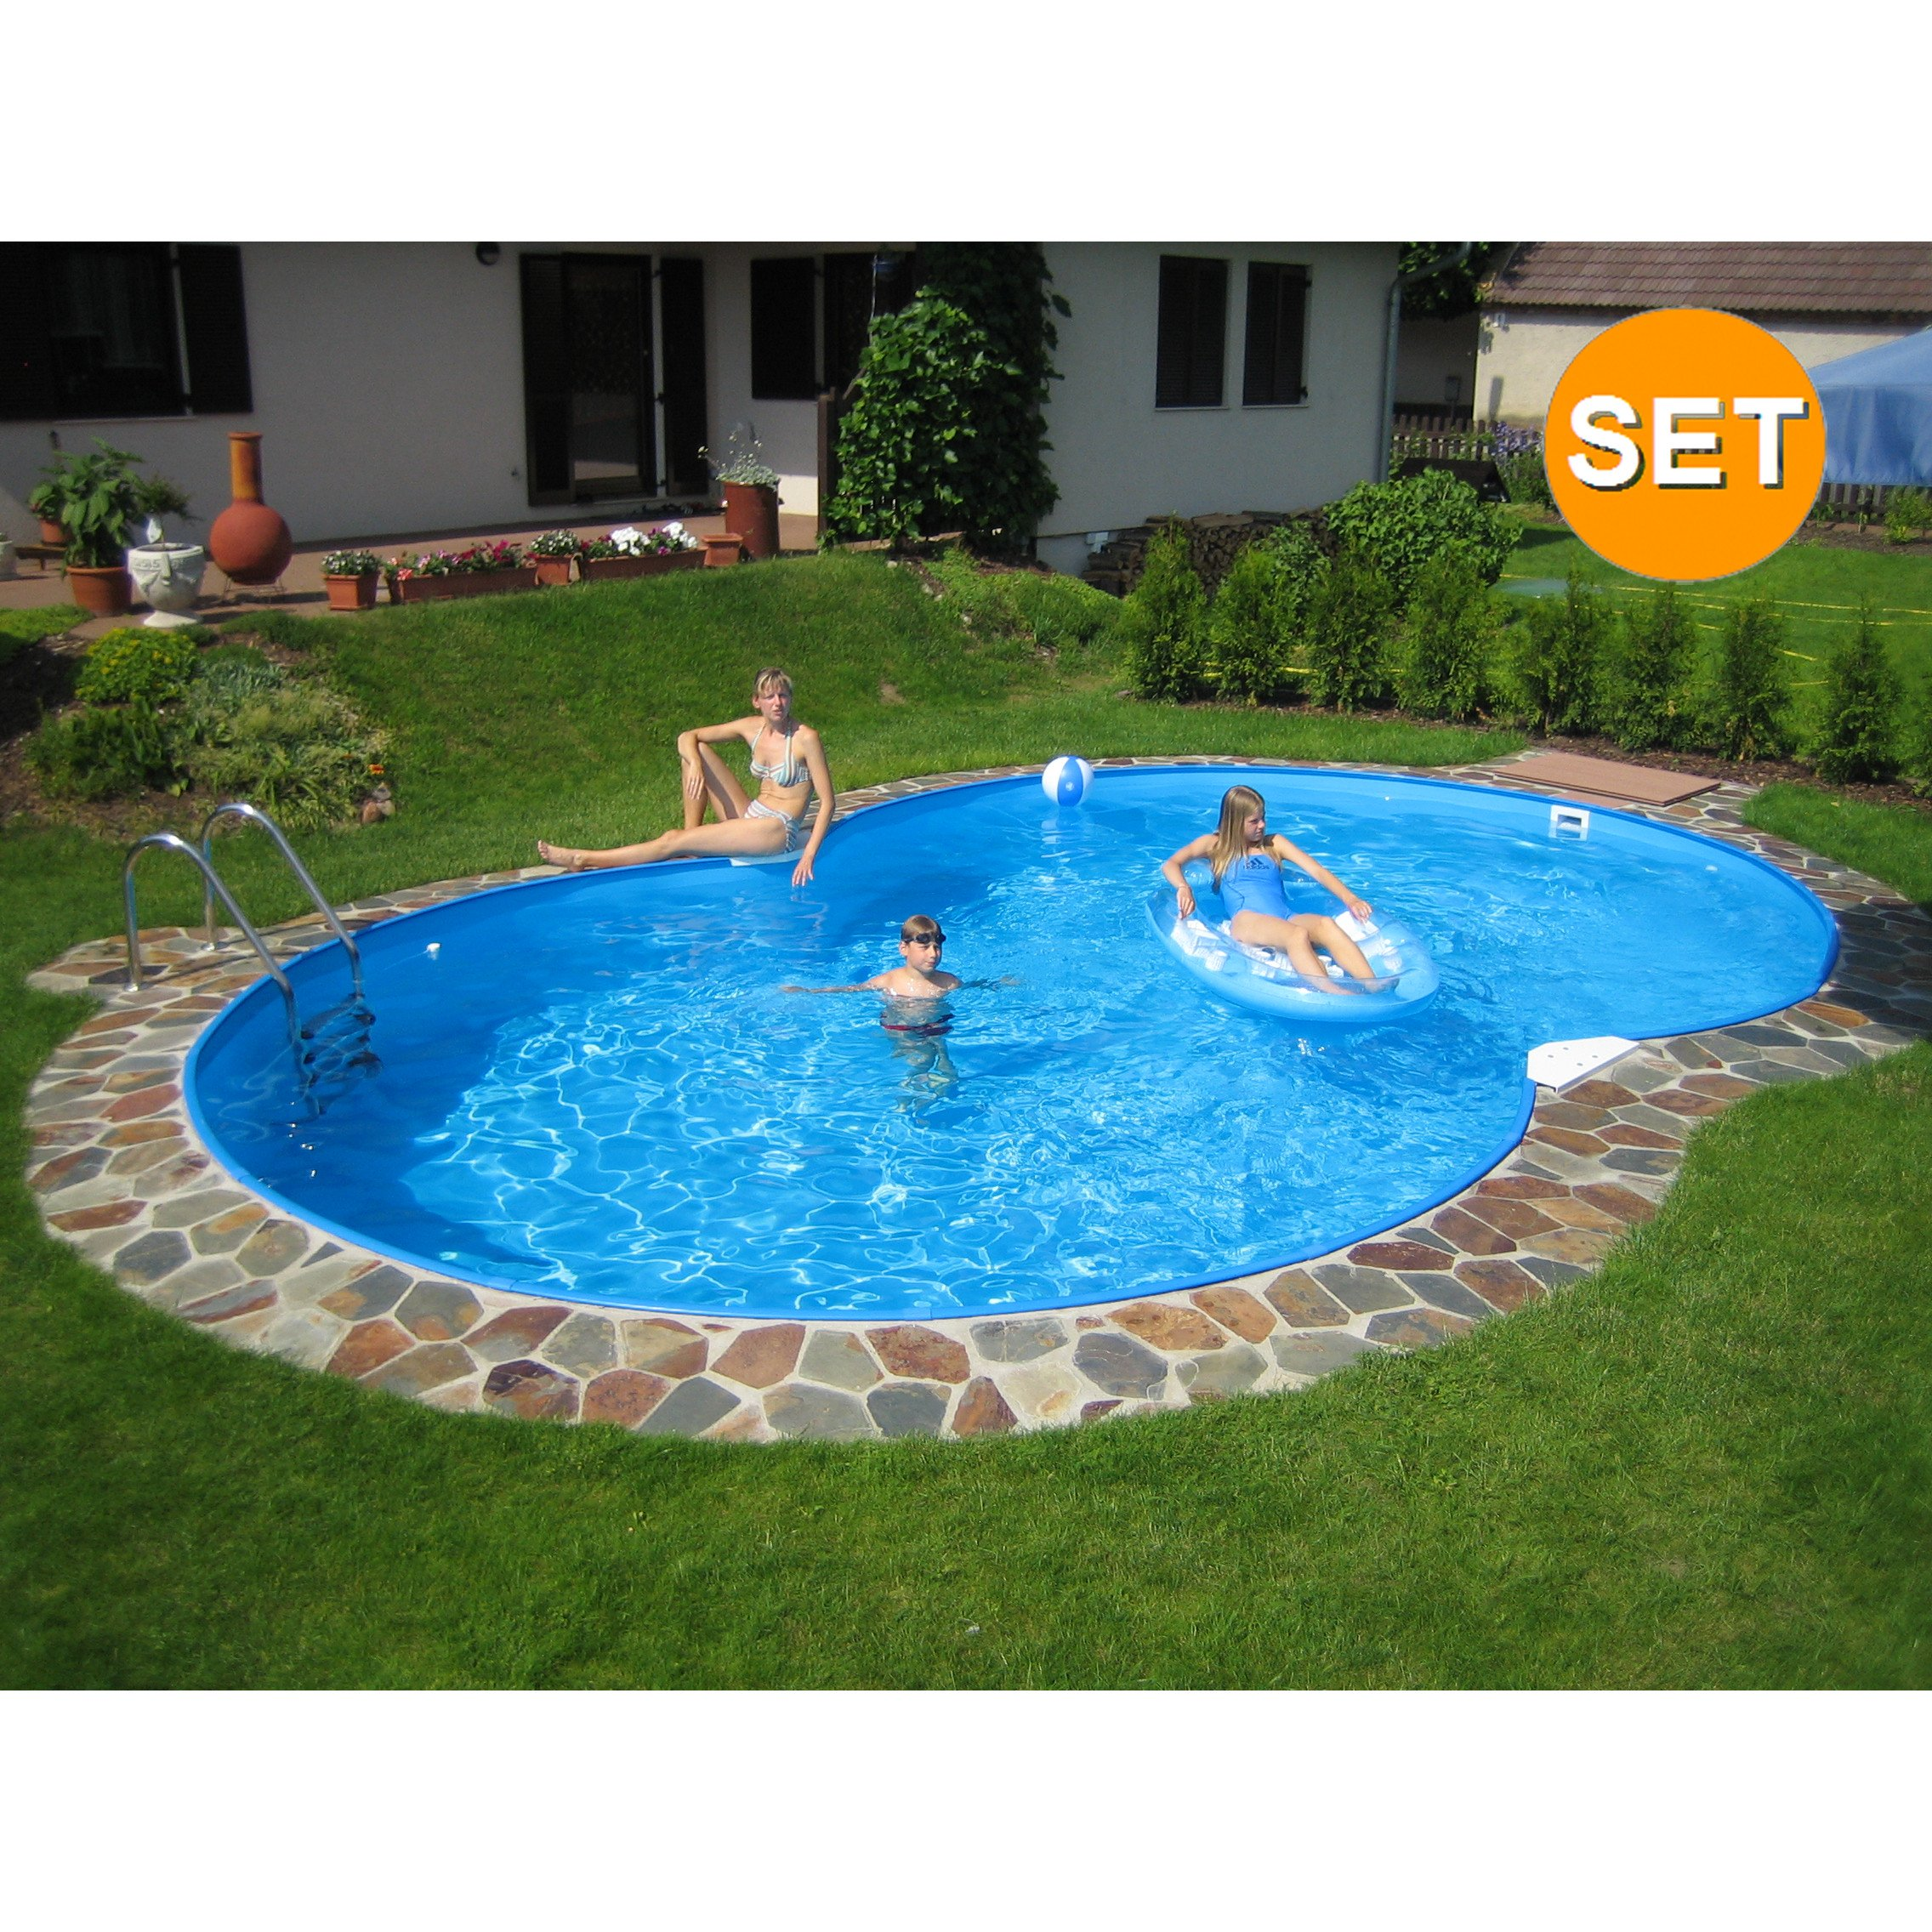 Family achtform pool 650 x 420 x 120 cm komplettset for Stahlwandbecken achtform